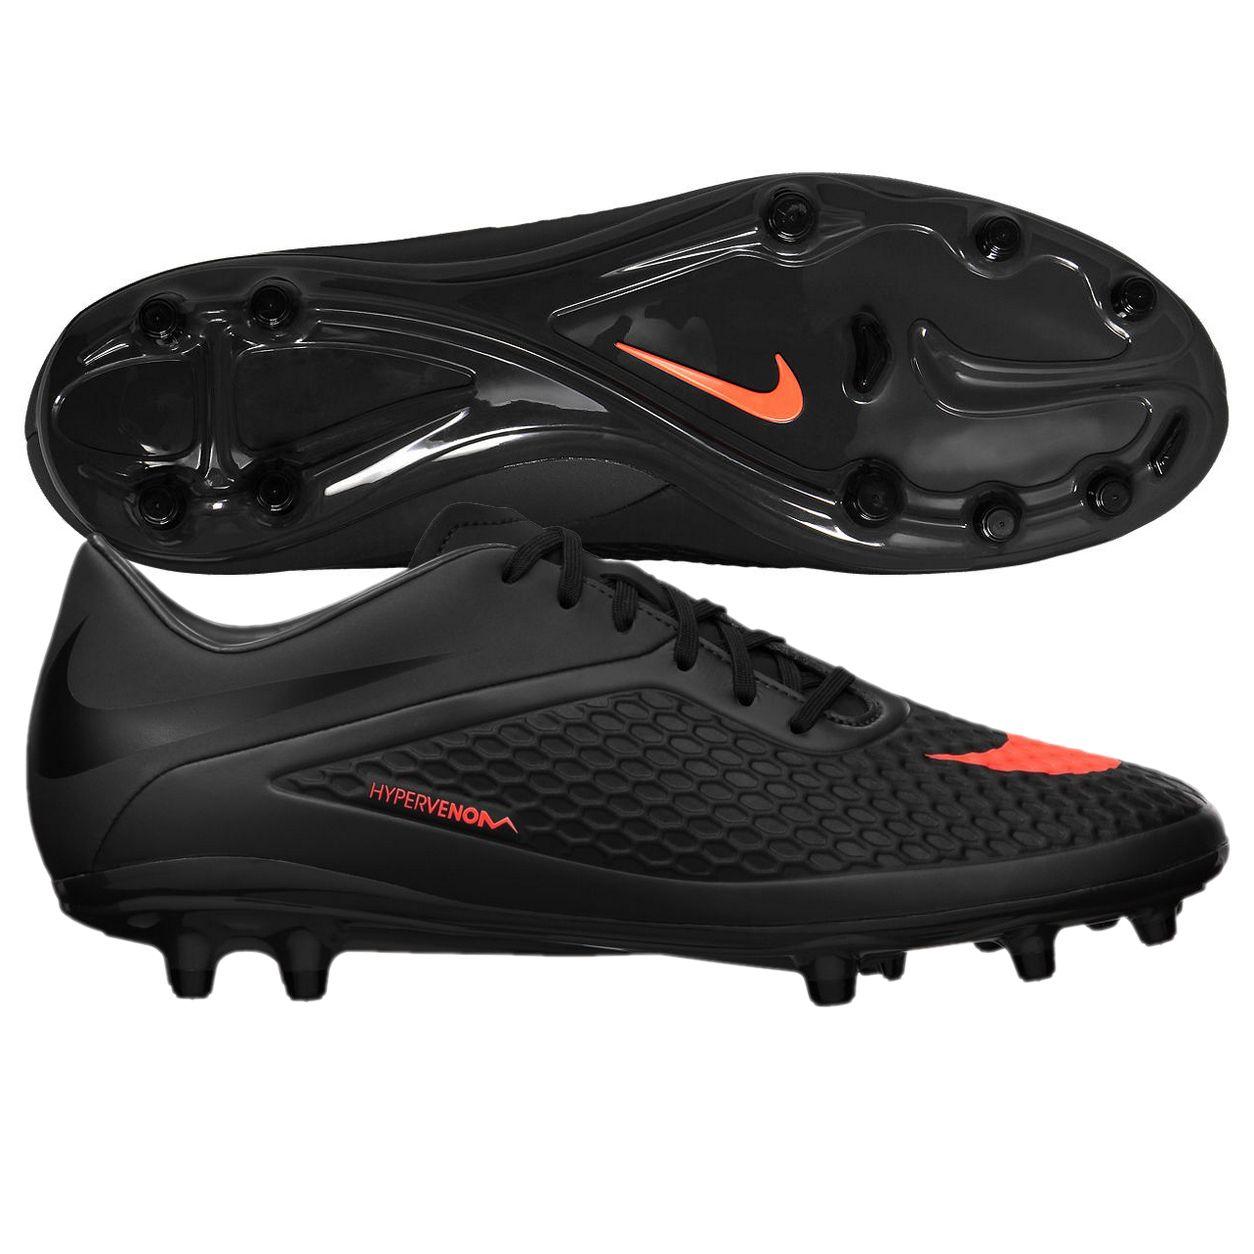 599730 Fg Phelon Bola Sepatu 080 Nike Hypervenom Merupakan pFIXIdnx